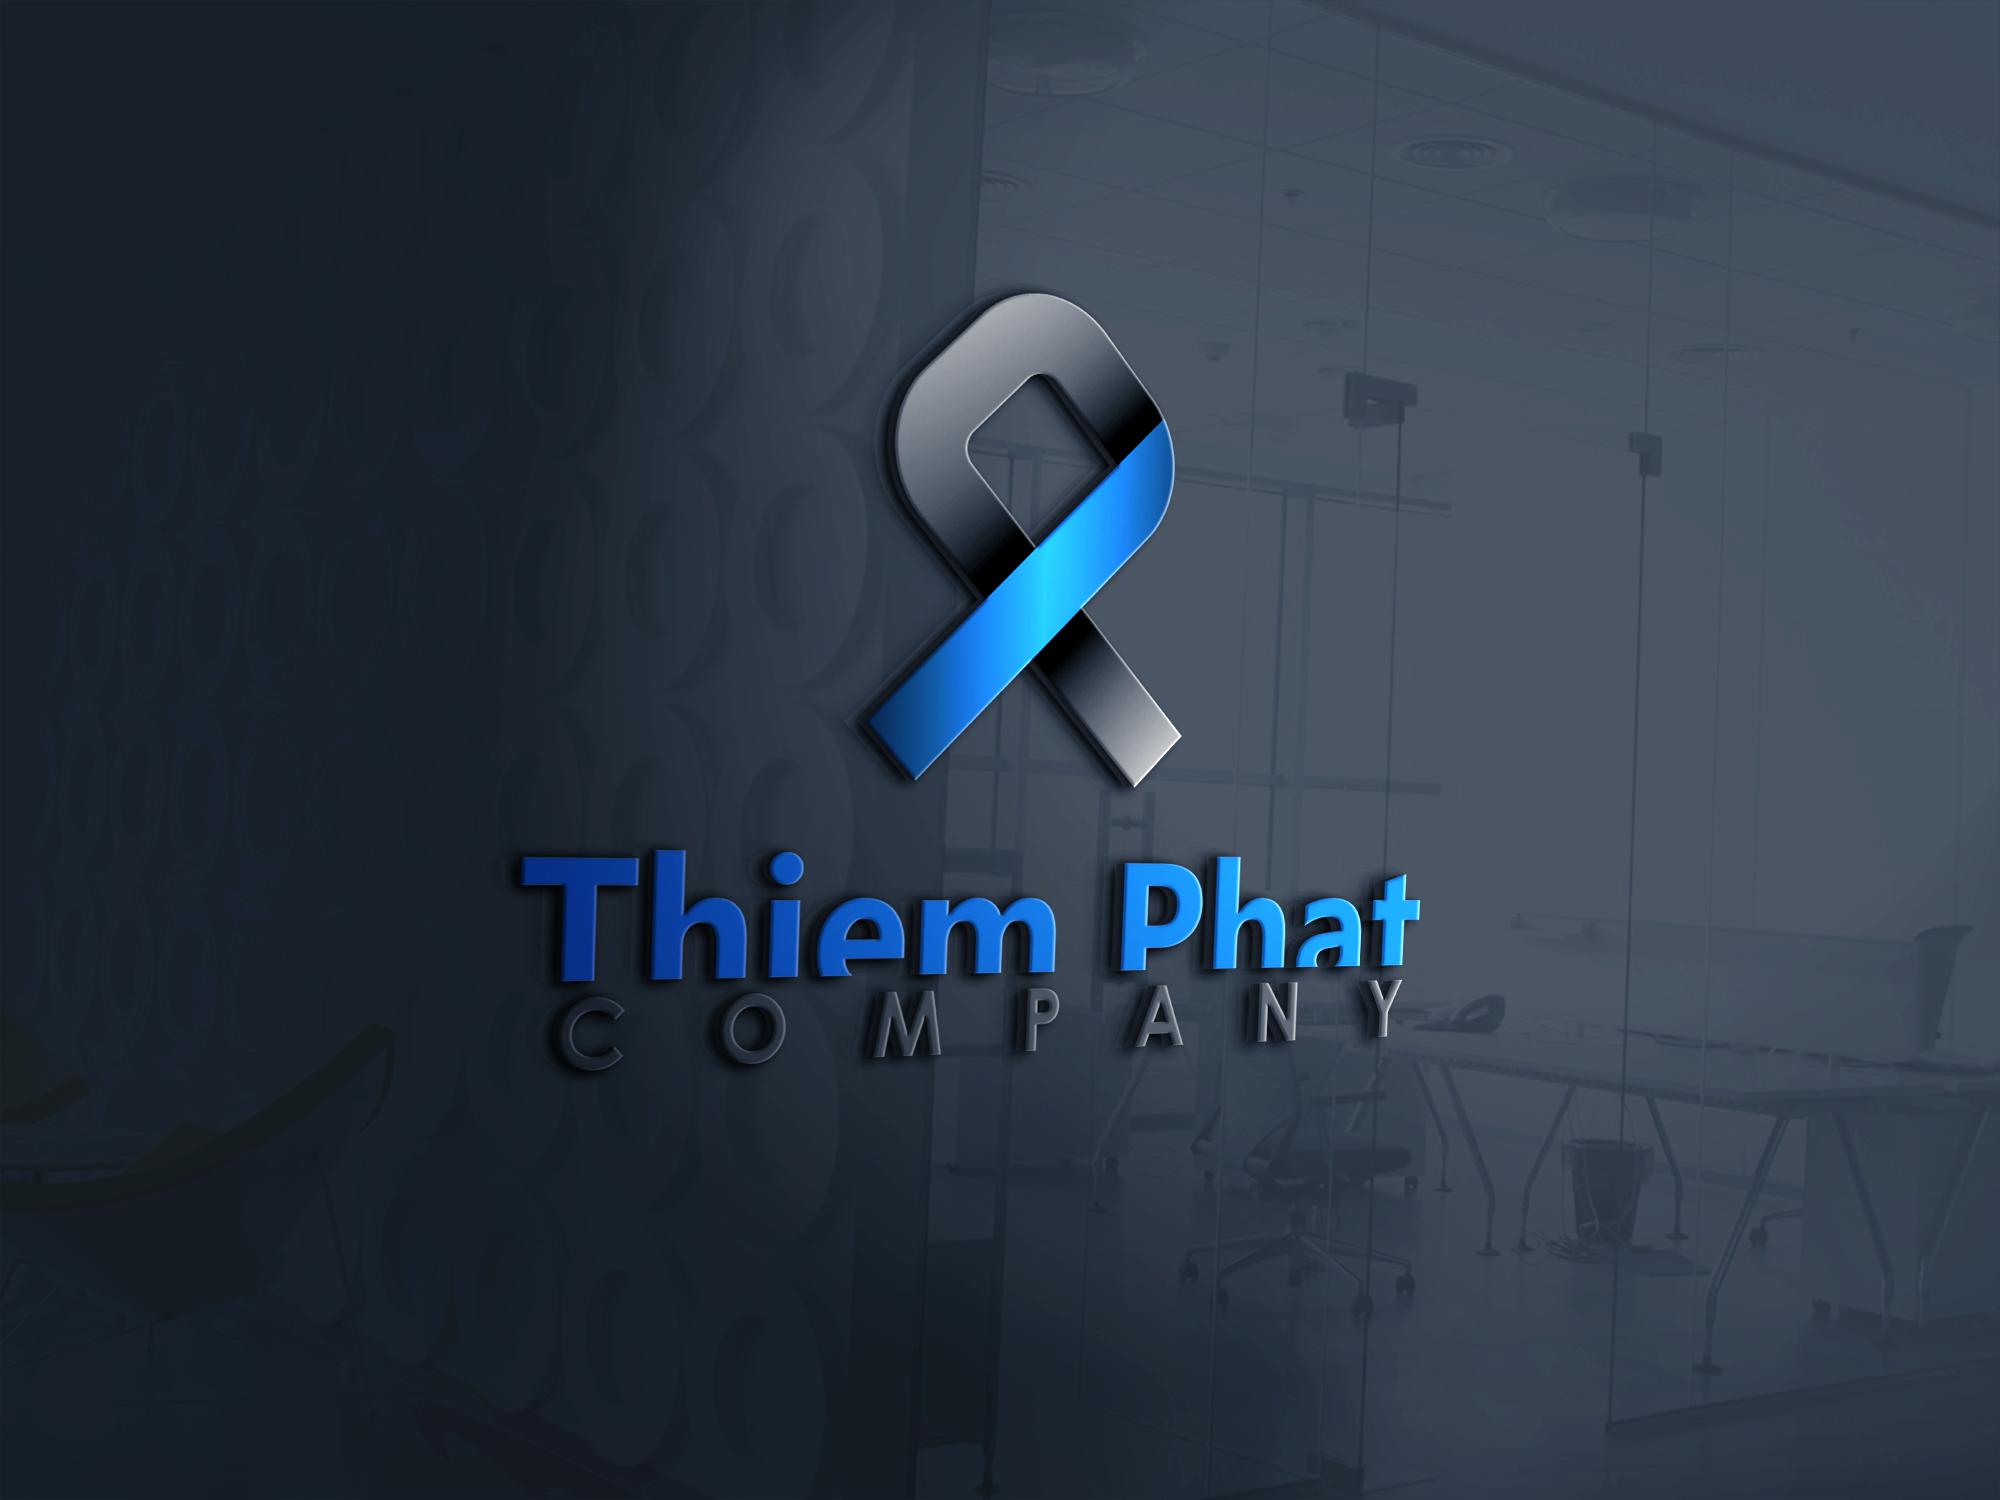 Logo Design by Net Bih - Entry No. 51 in the Logo Design Contest New Logo Design for Thiem Phat company.